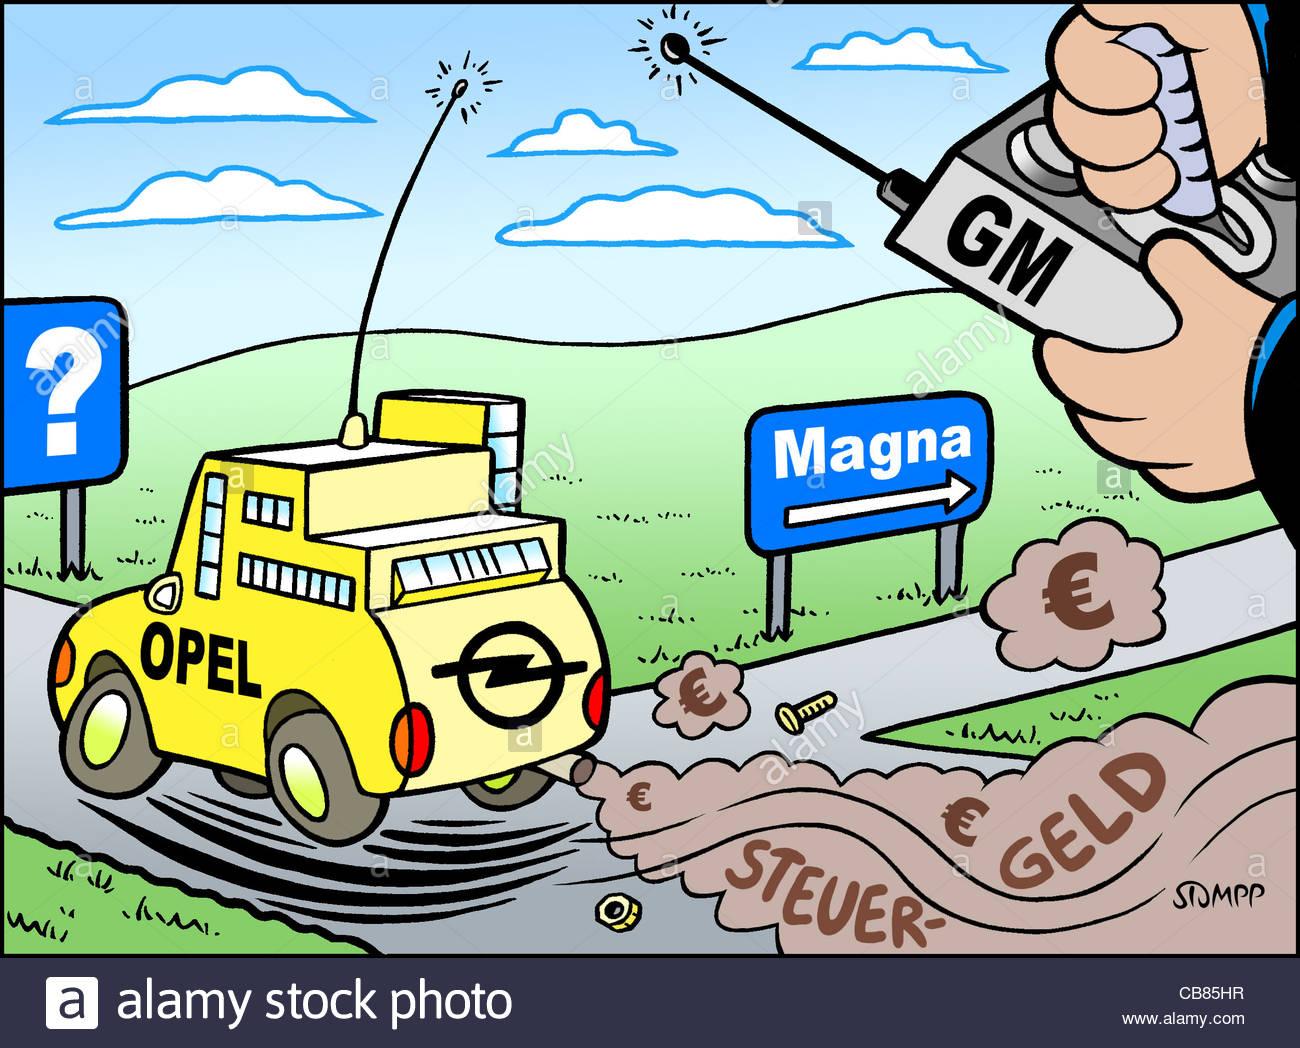 Cartoon Opel joke funny Humor funny funny funny funny humorous Cartoon cart